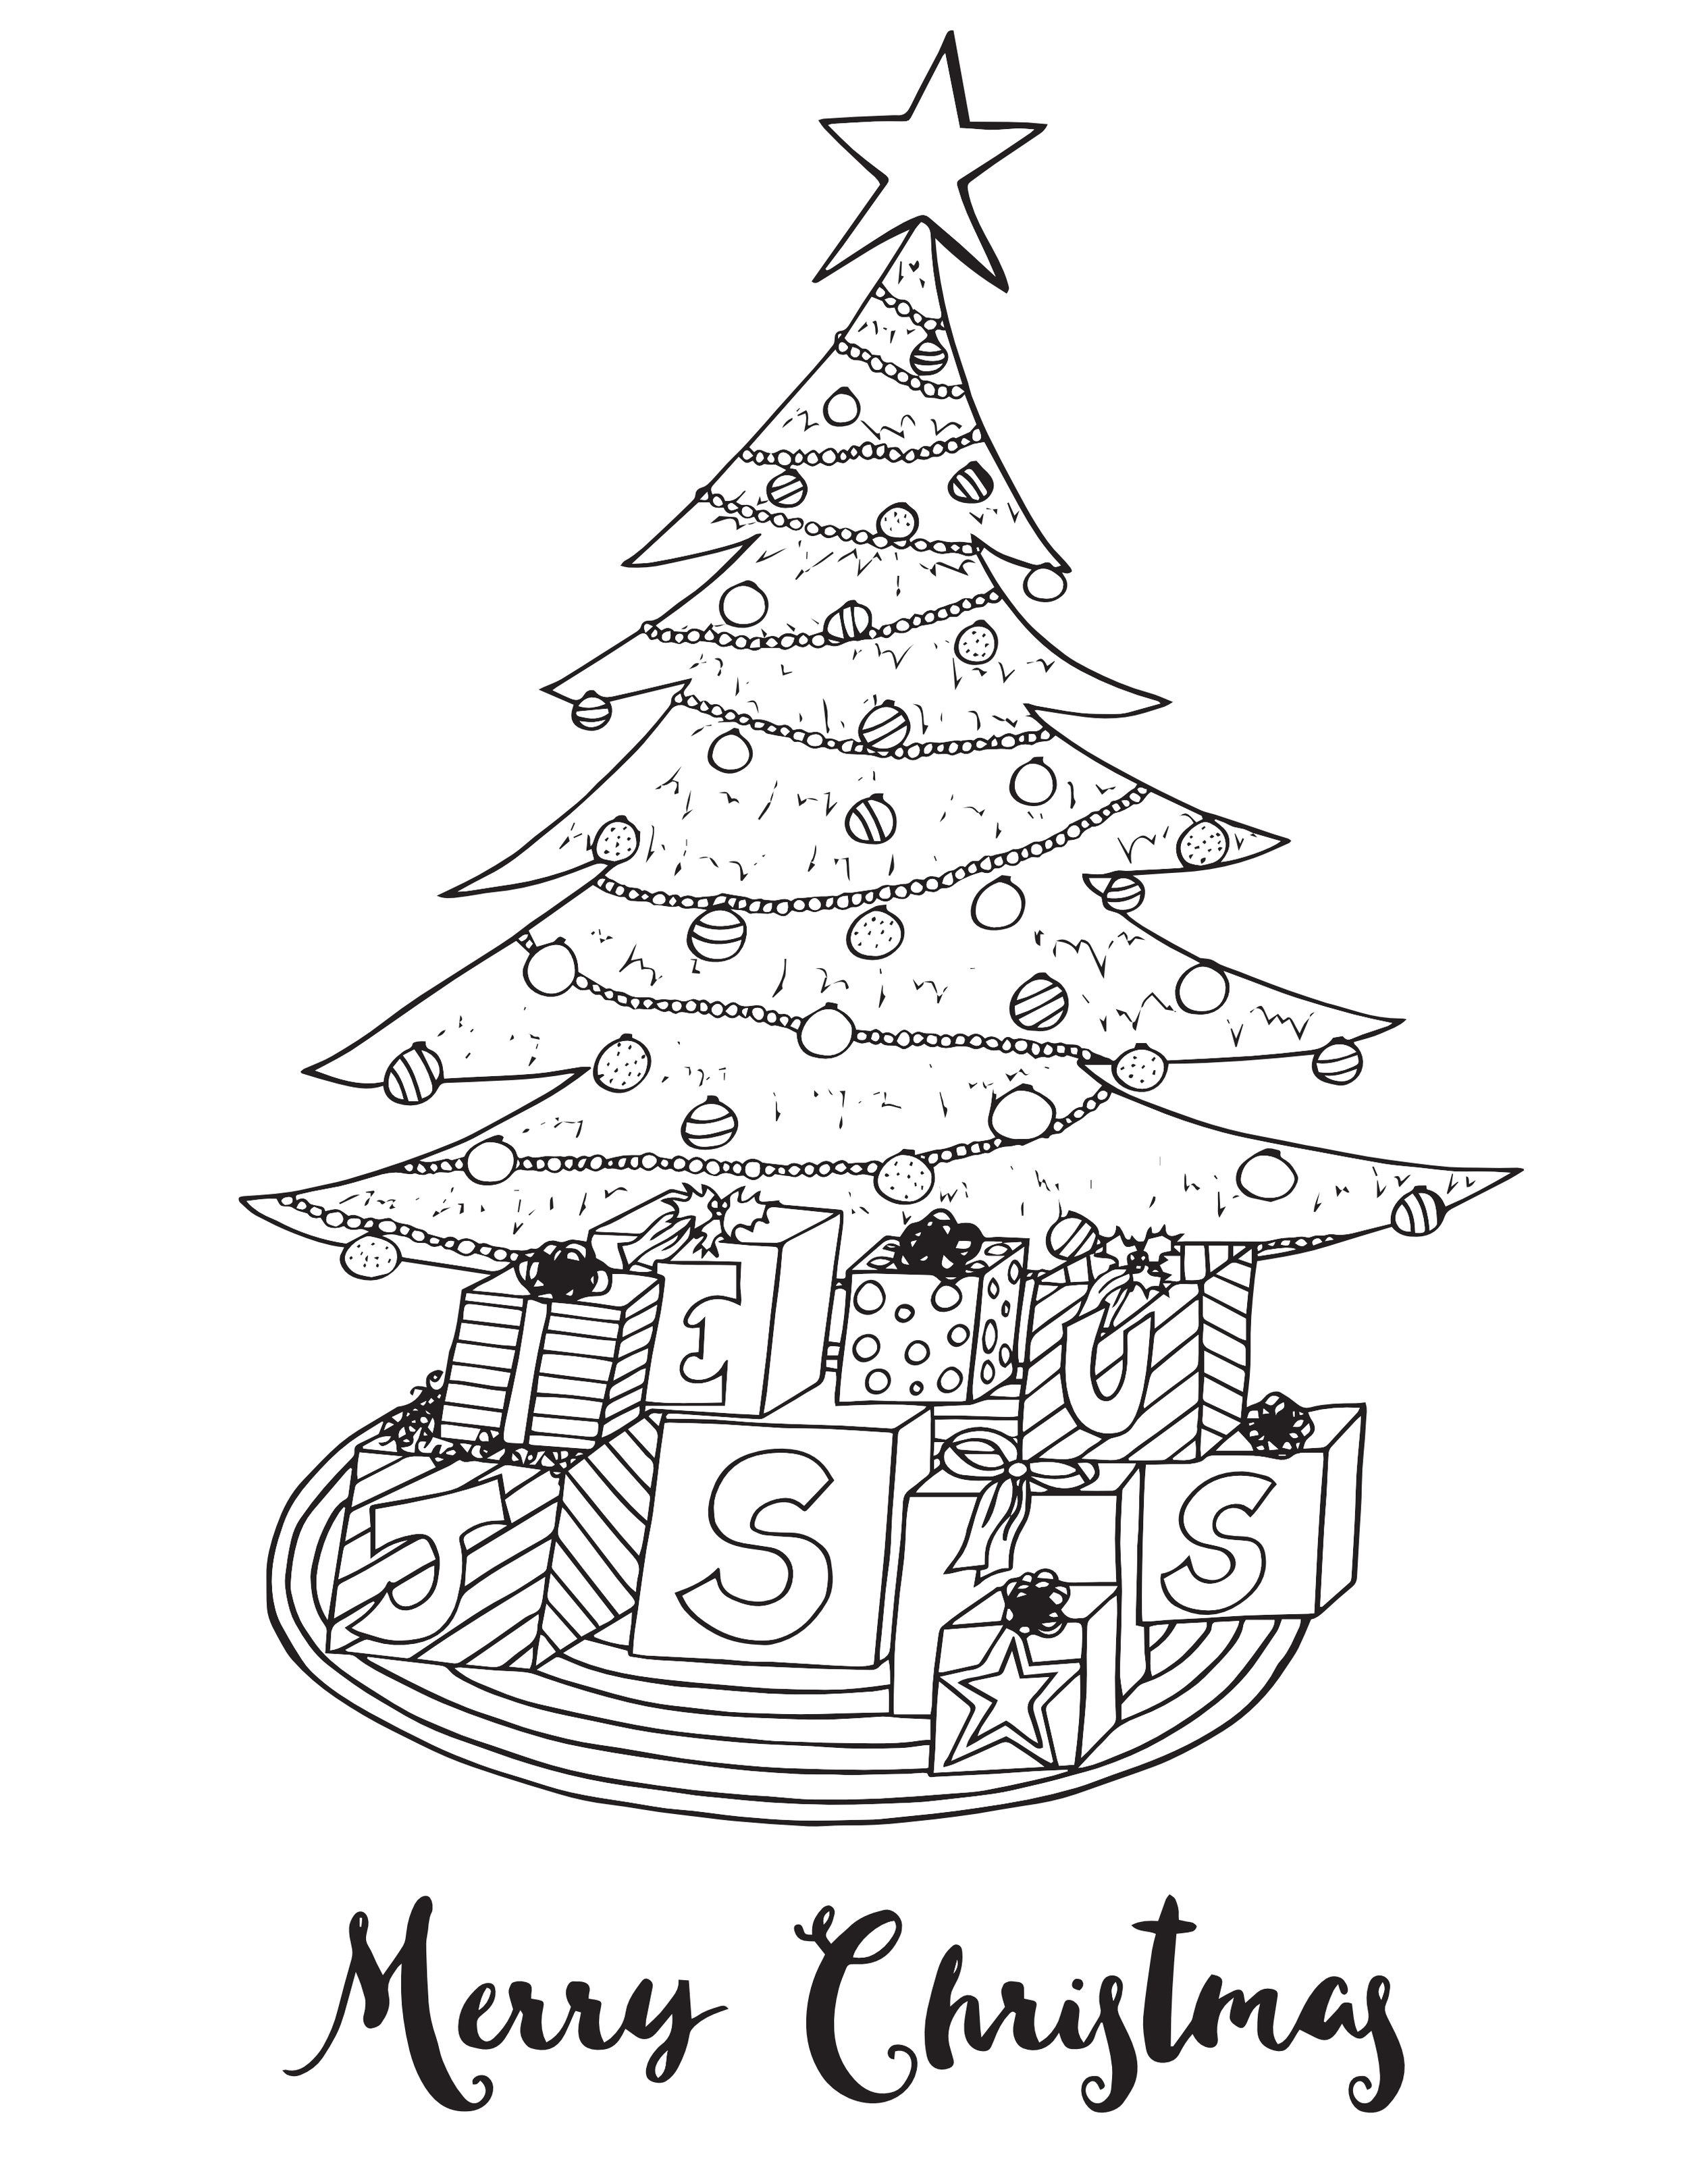 Merry Christmas .jpg